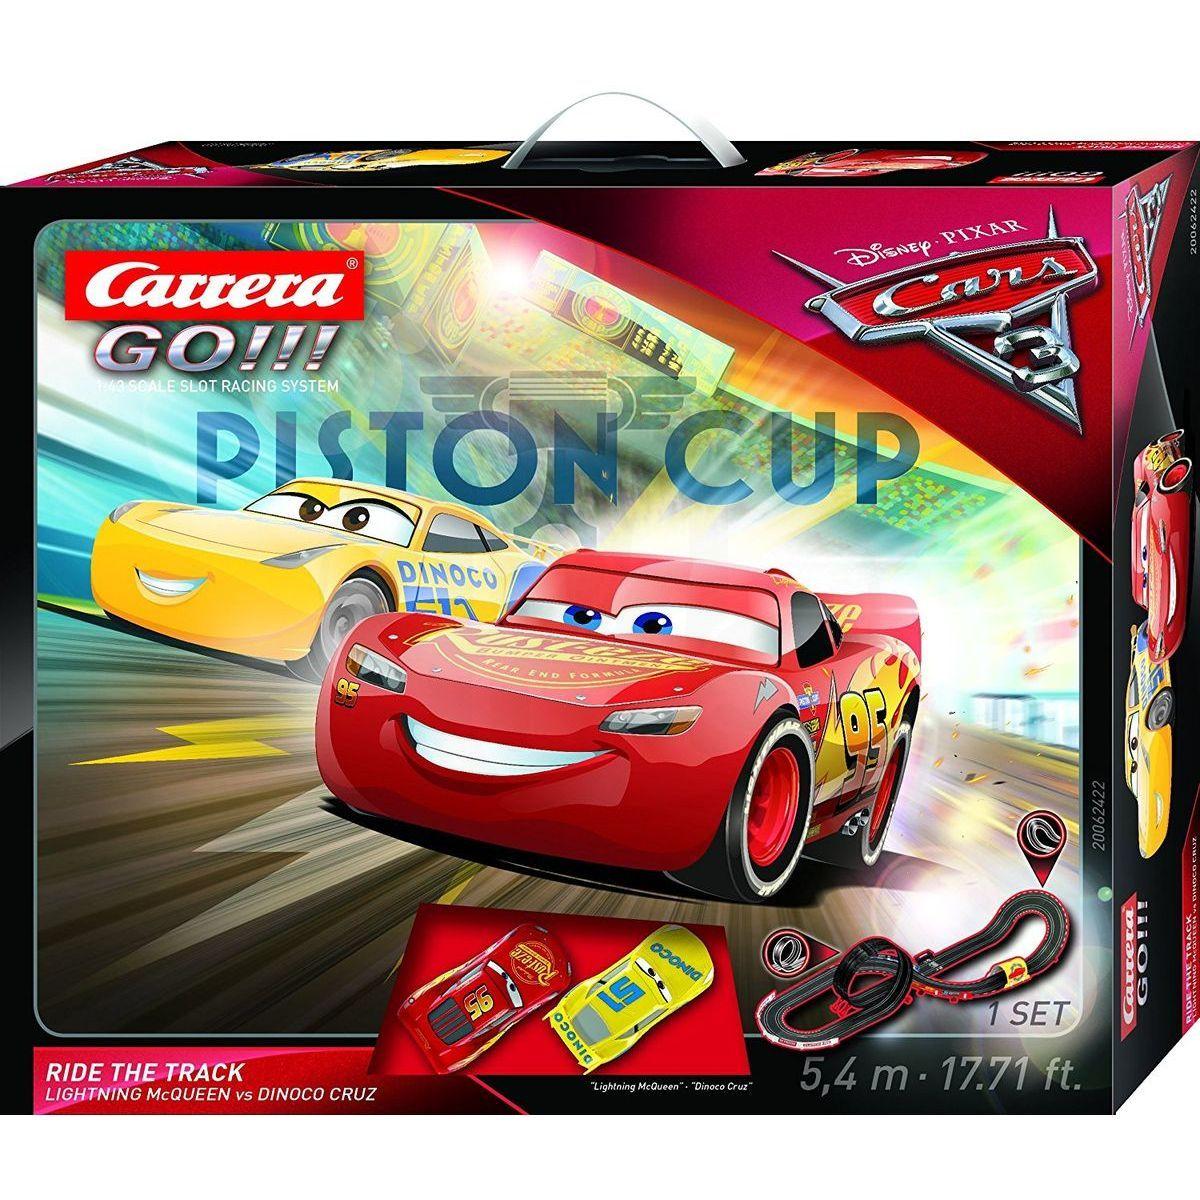 Carrera GO Autodráha Cars 3 Ride Track